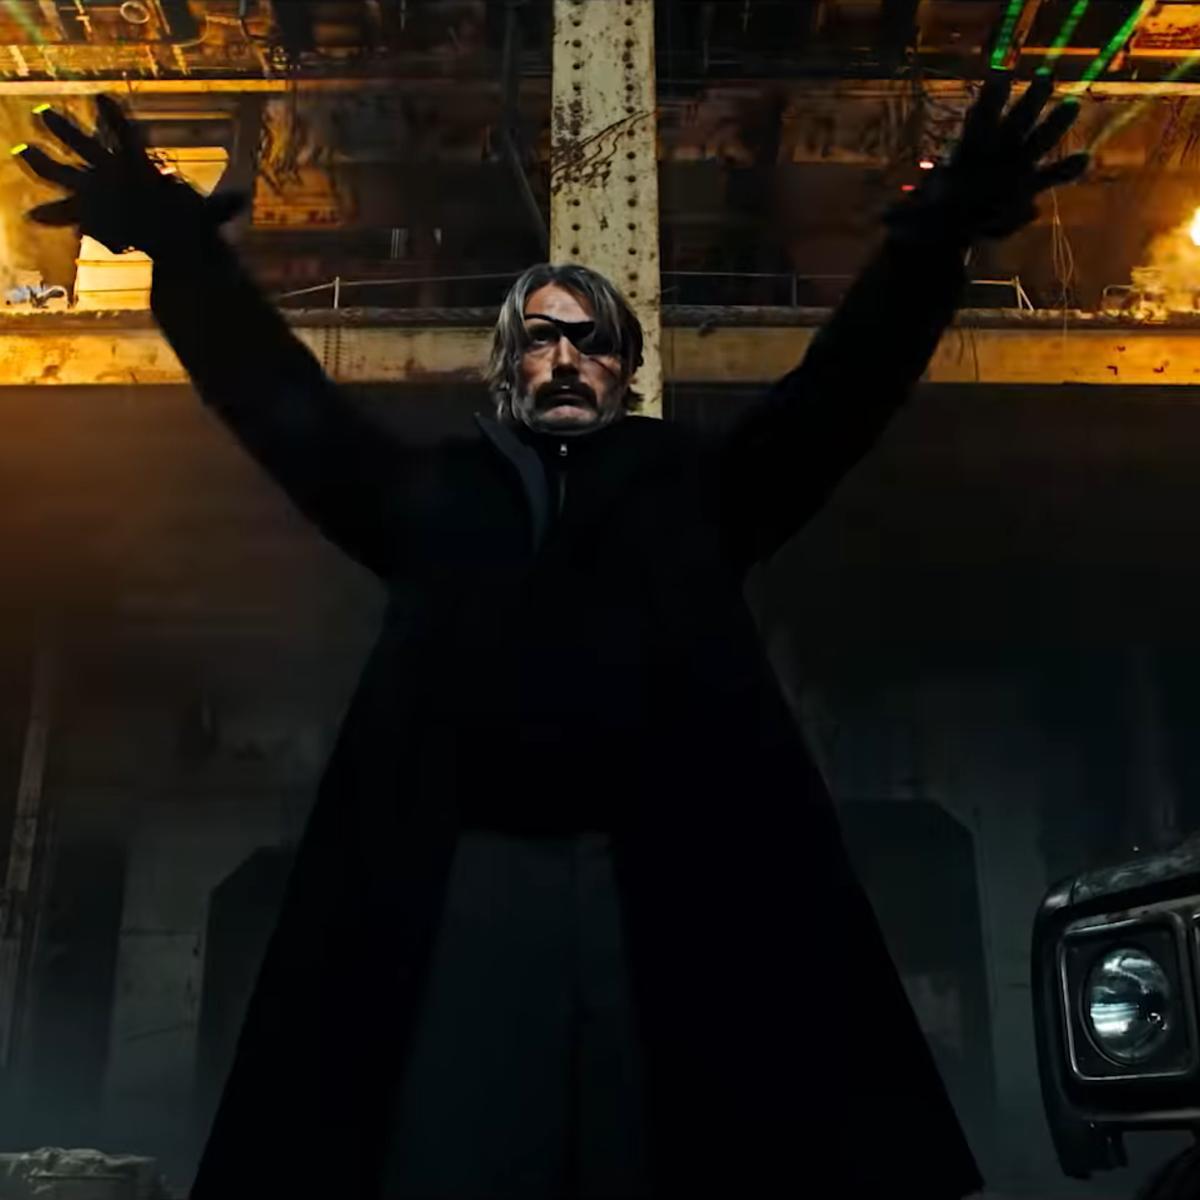 'Polar' Trailer: Assassin Mads Mikkelsen Is Marked for Death in Netflix Thriller